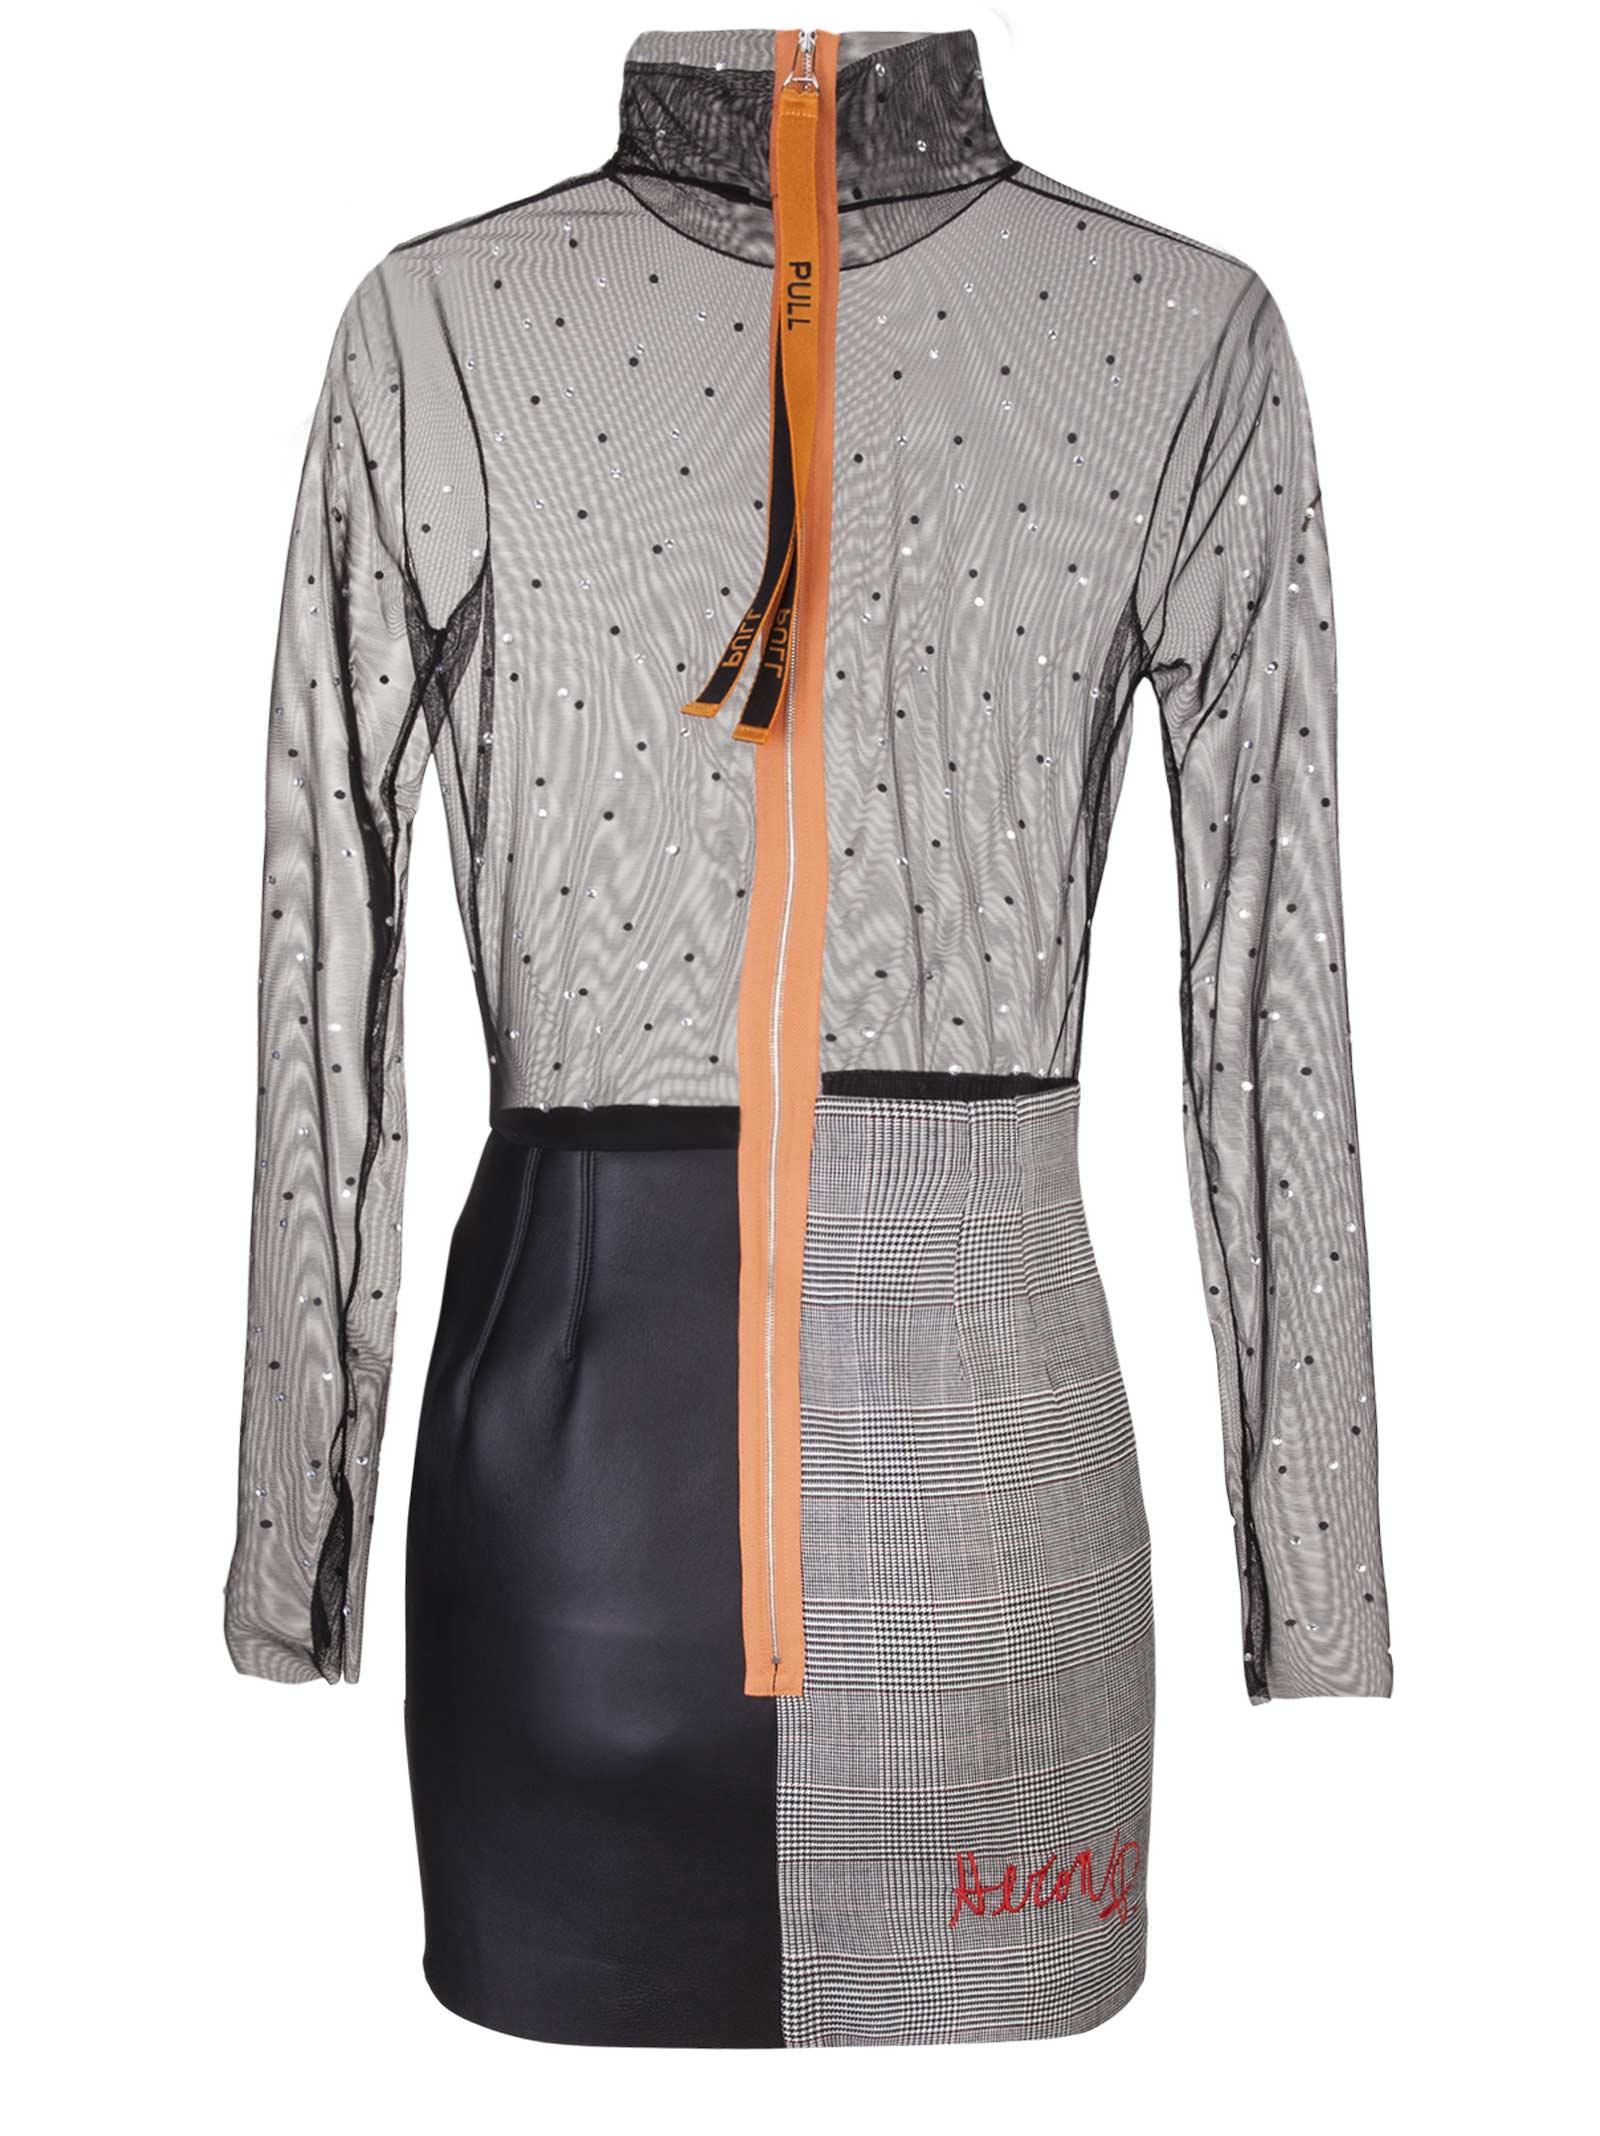 Heron Preston Dress